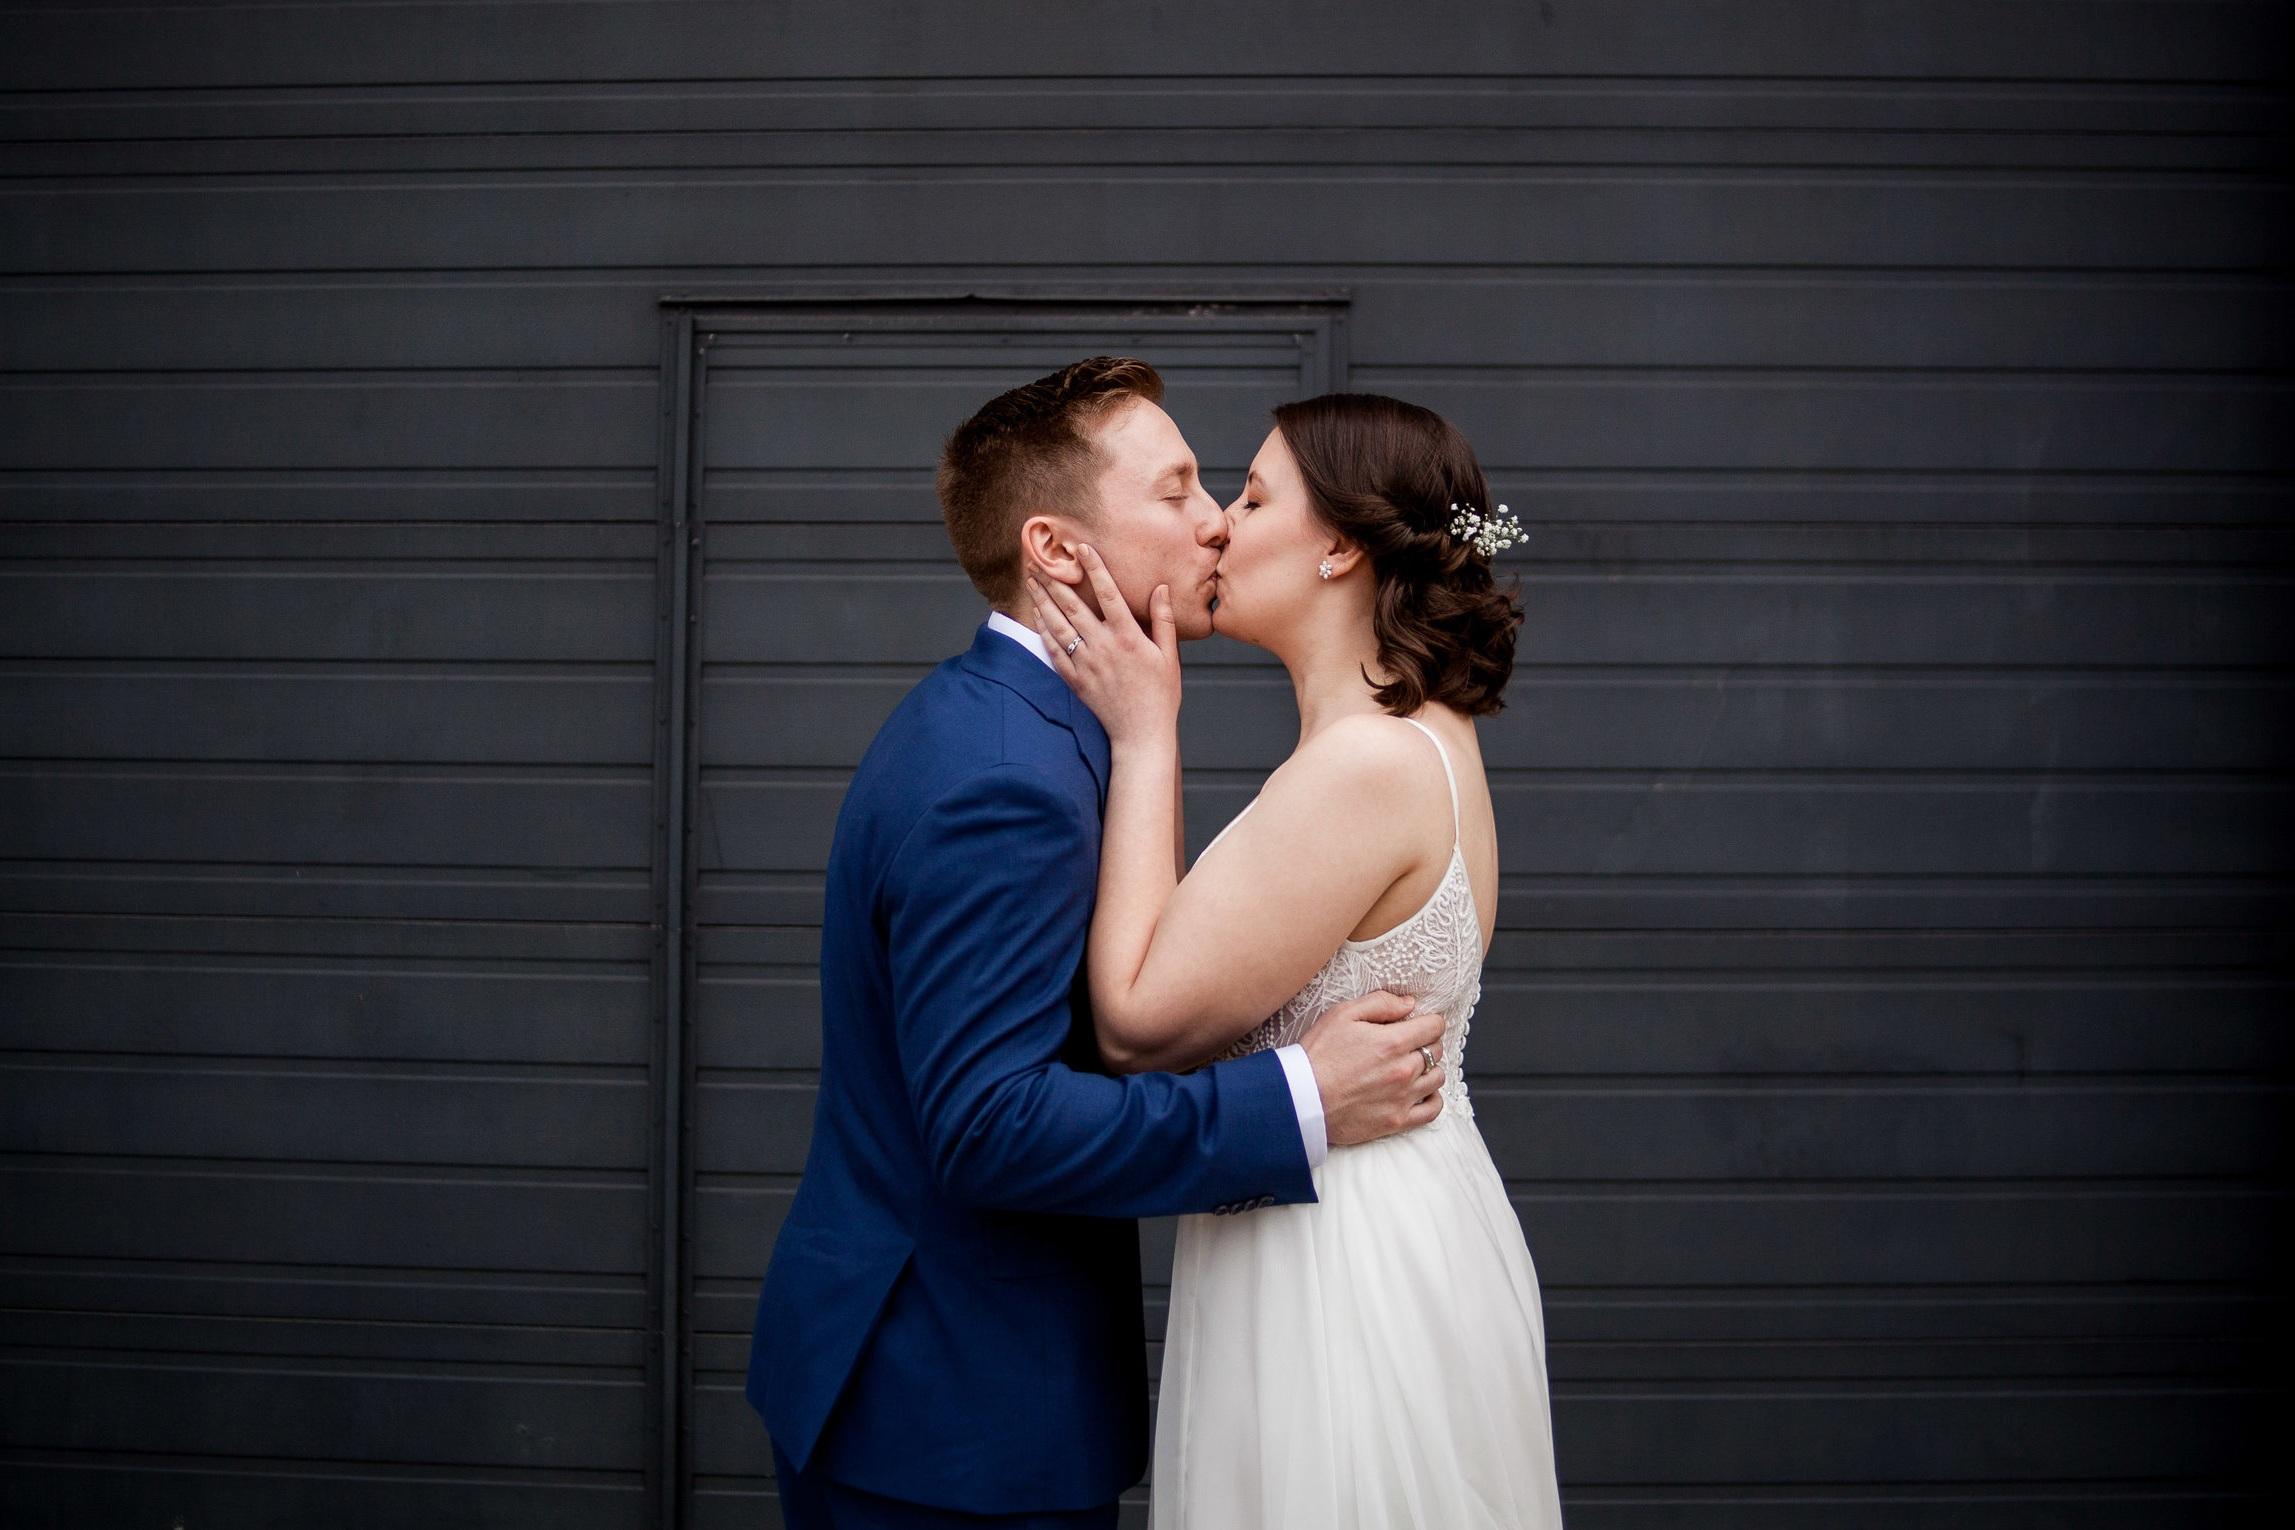 pittsburgh_wedding_photographer_liz_capuano-0294.jpg